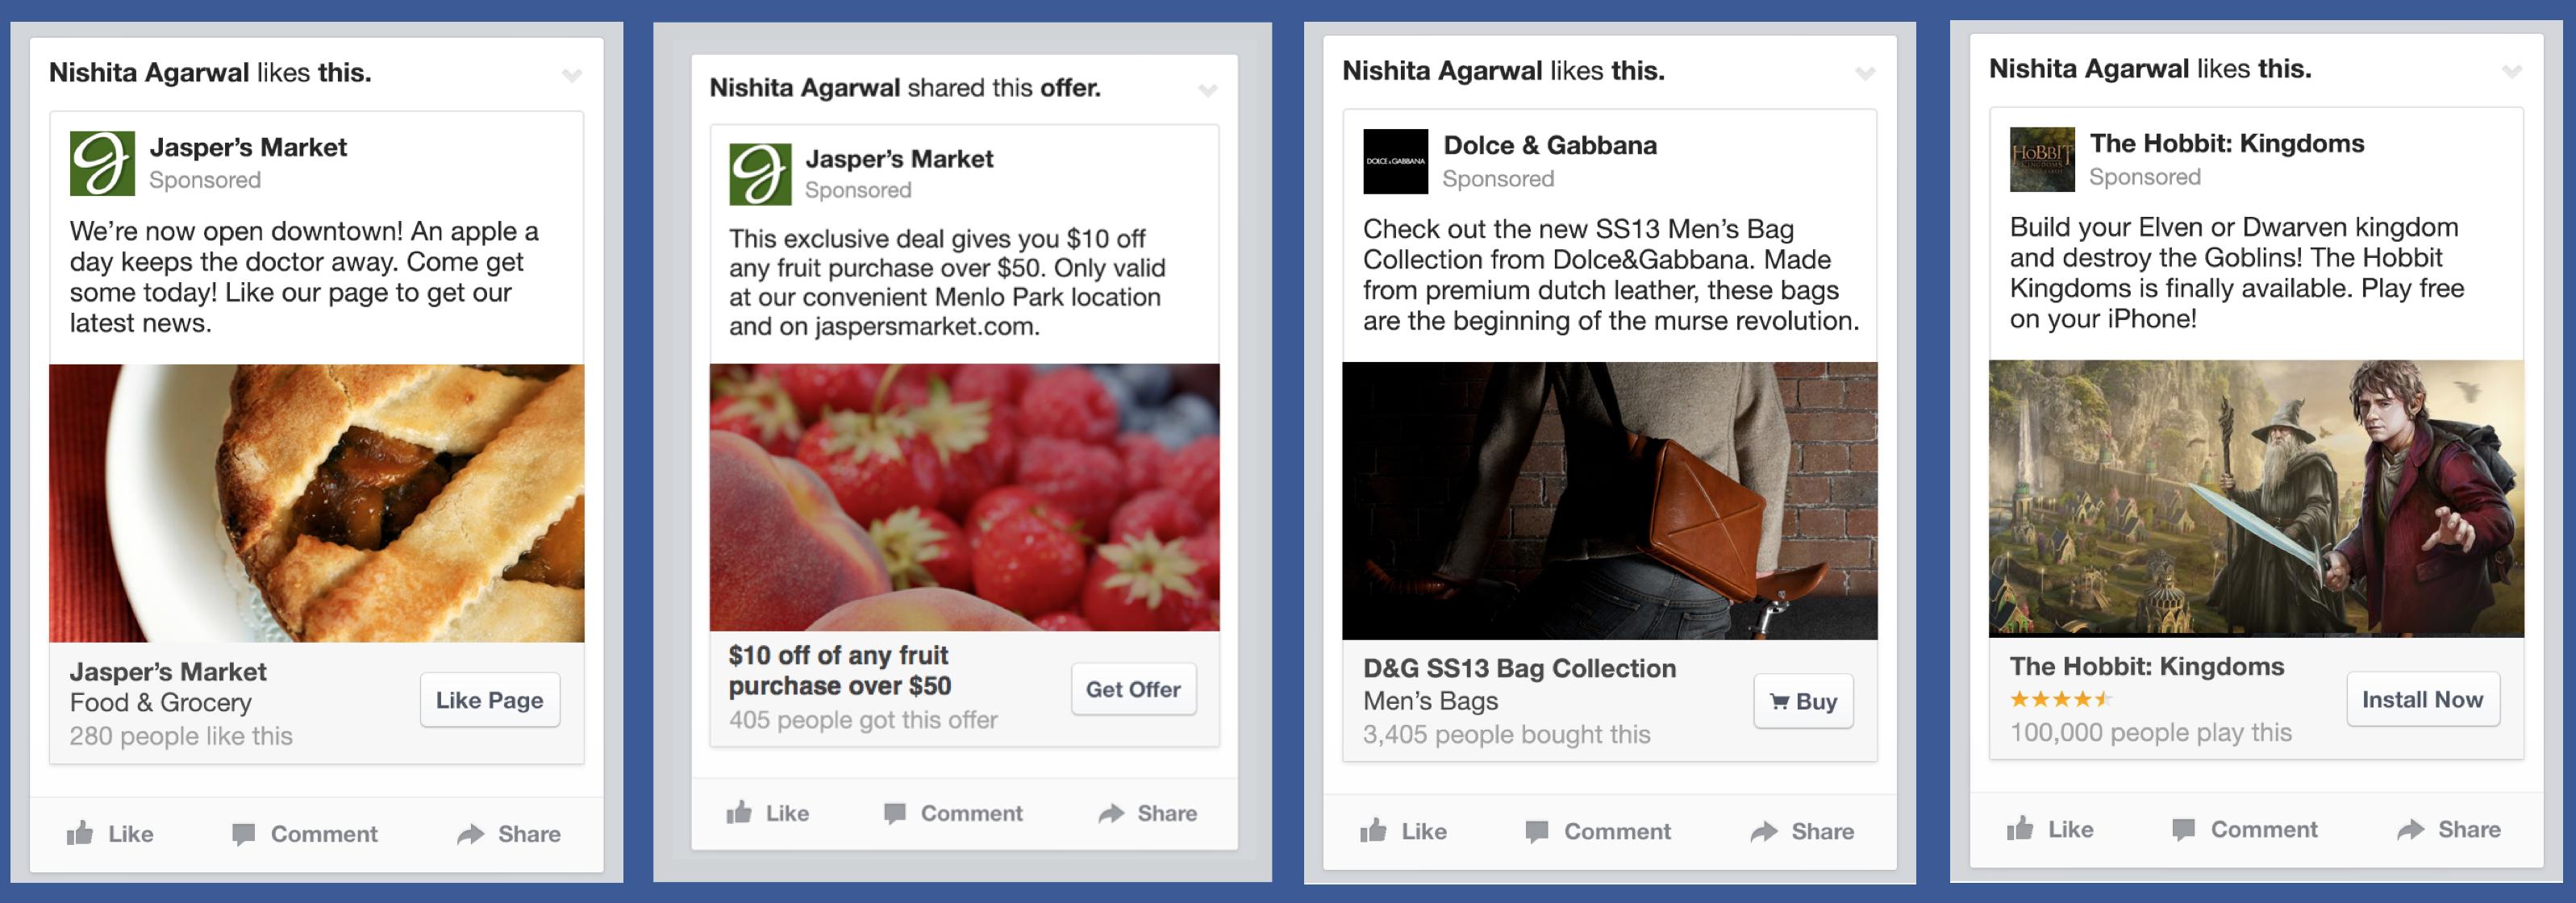 Chạy quảng cáo facebook khi làm affiliate marketing